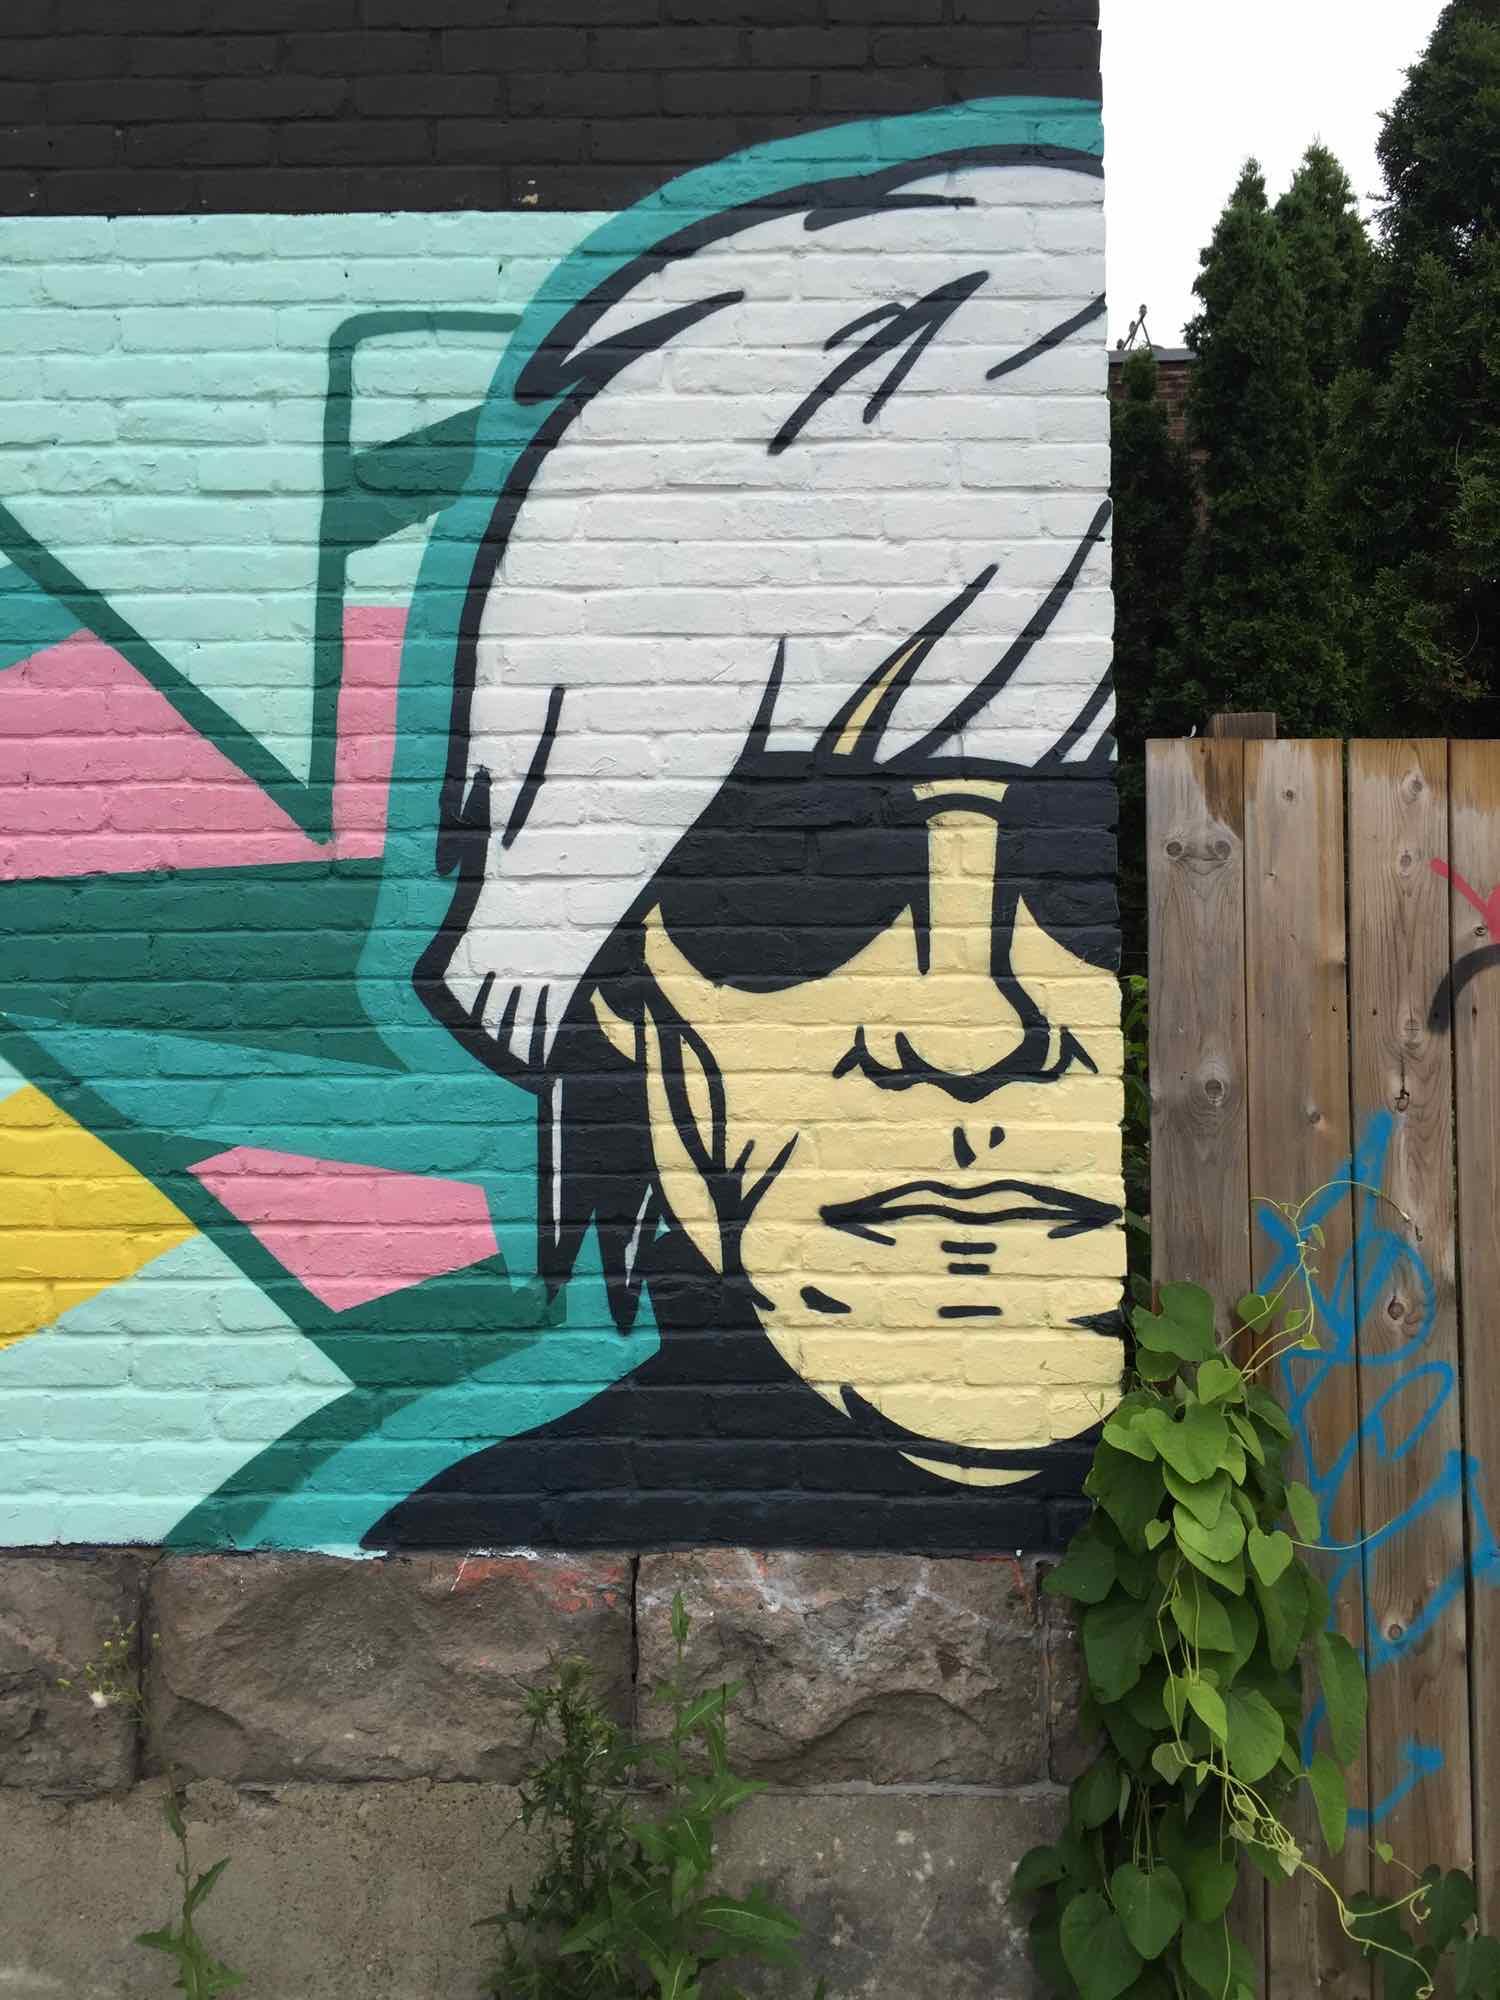 The_Walls_Of_Montreal-Ezra_Soiferman - 84.jpg